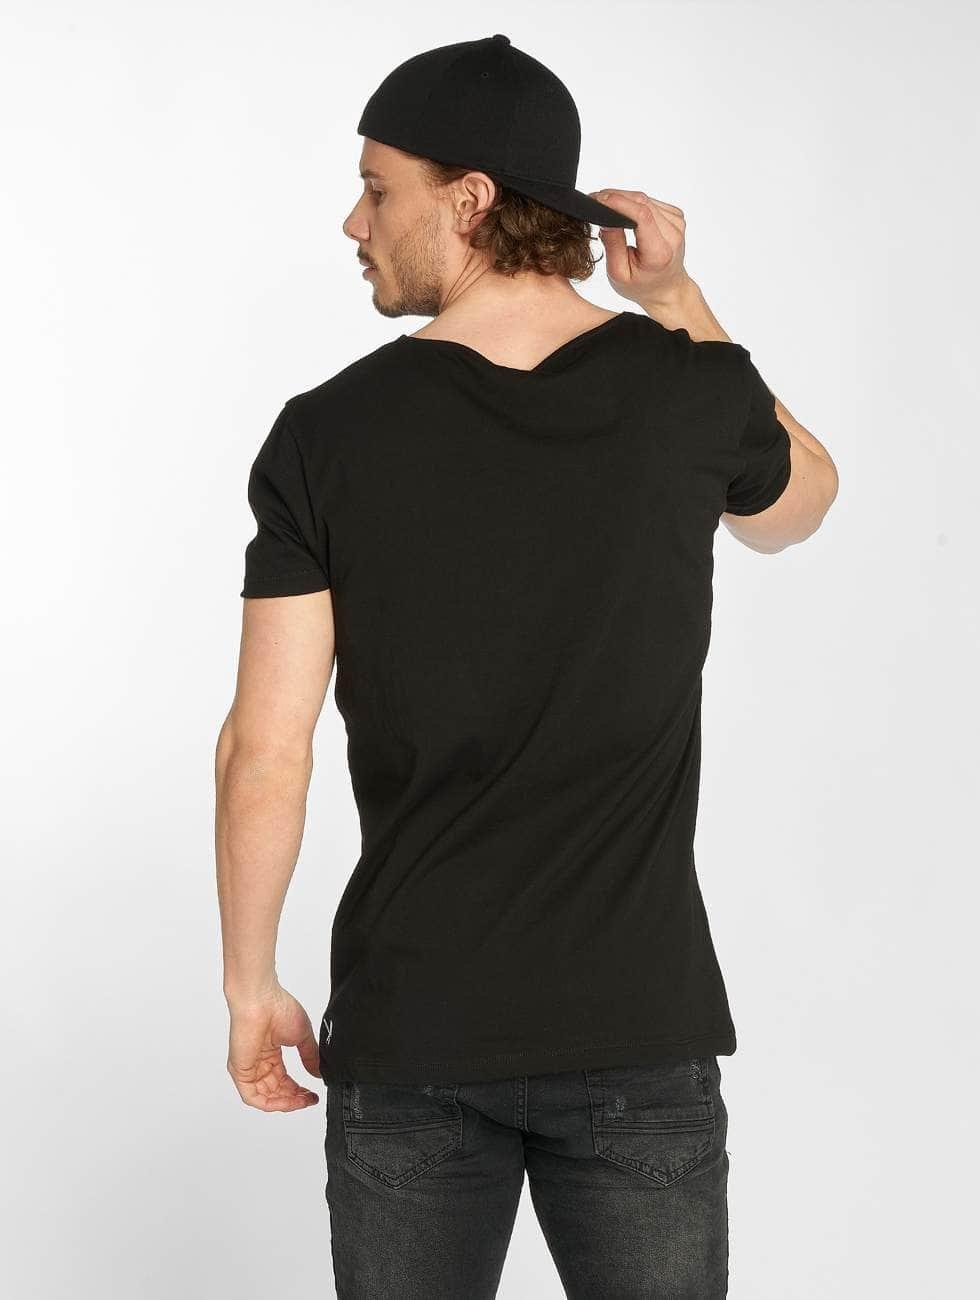 Distorted People T-Shirt BB Blades Camo noir